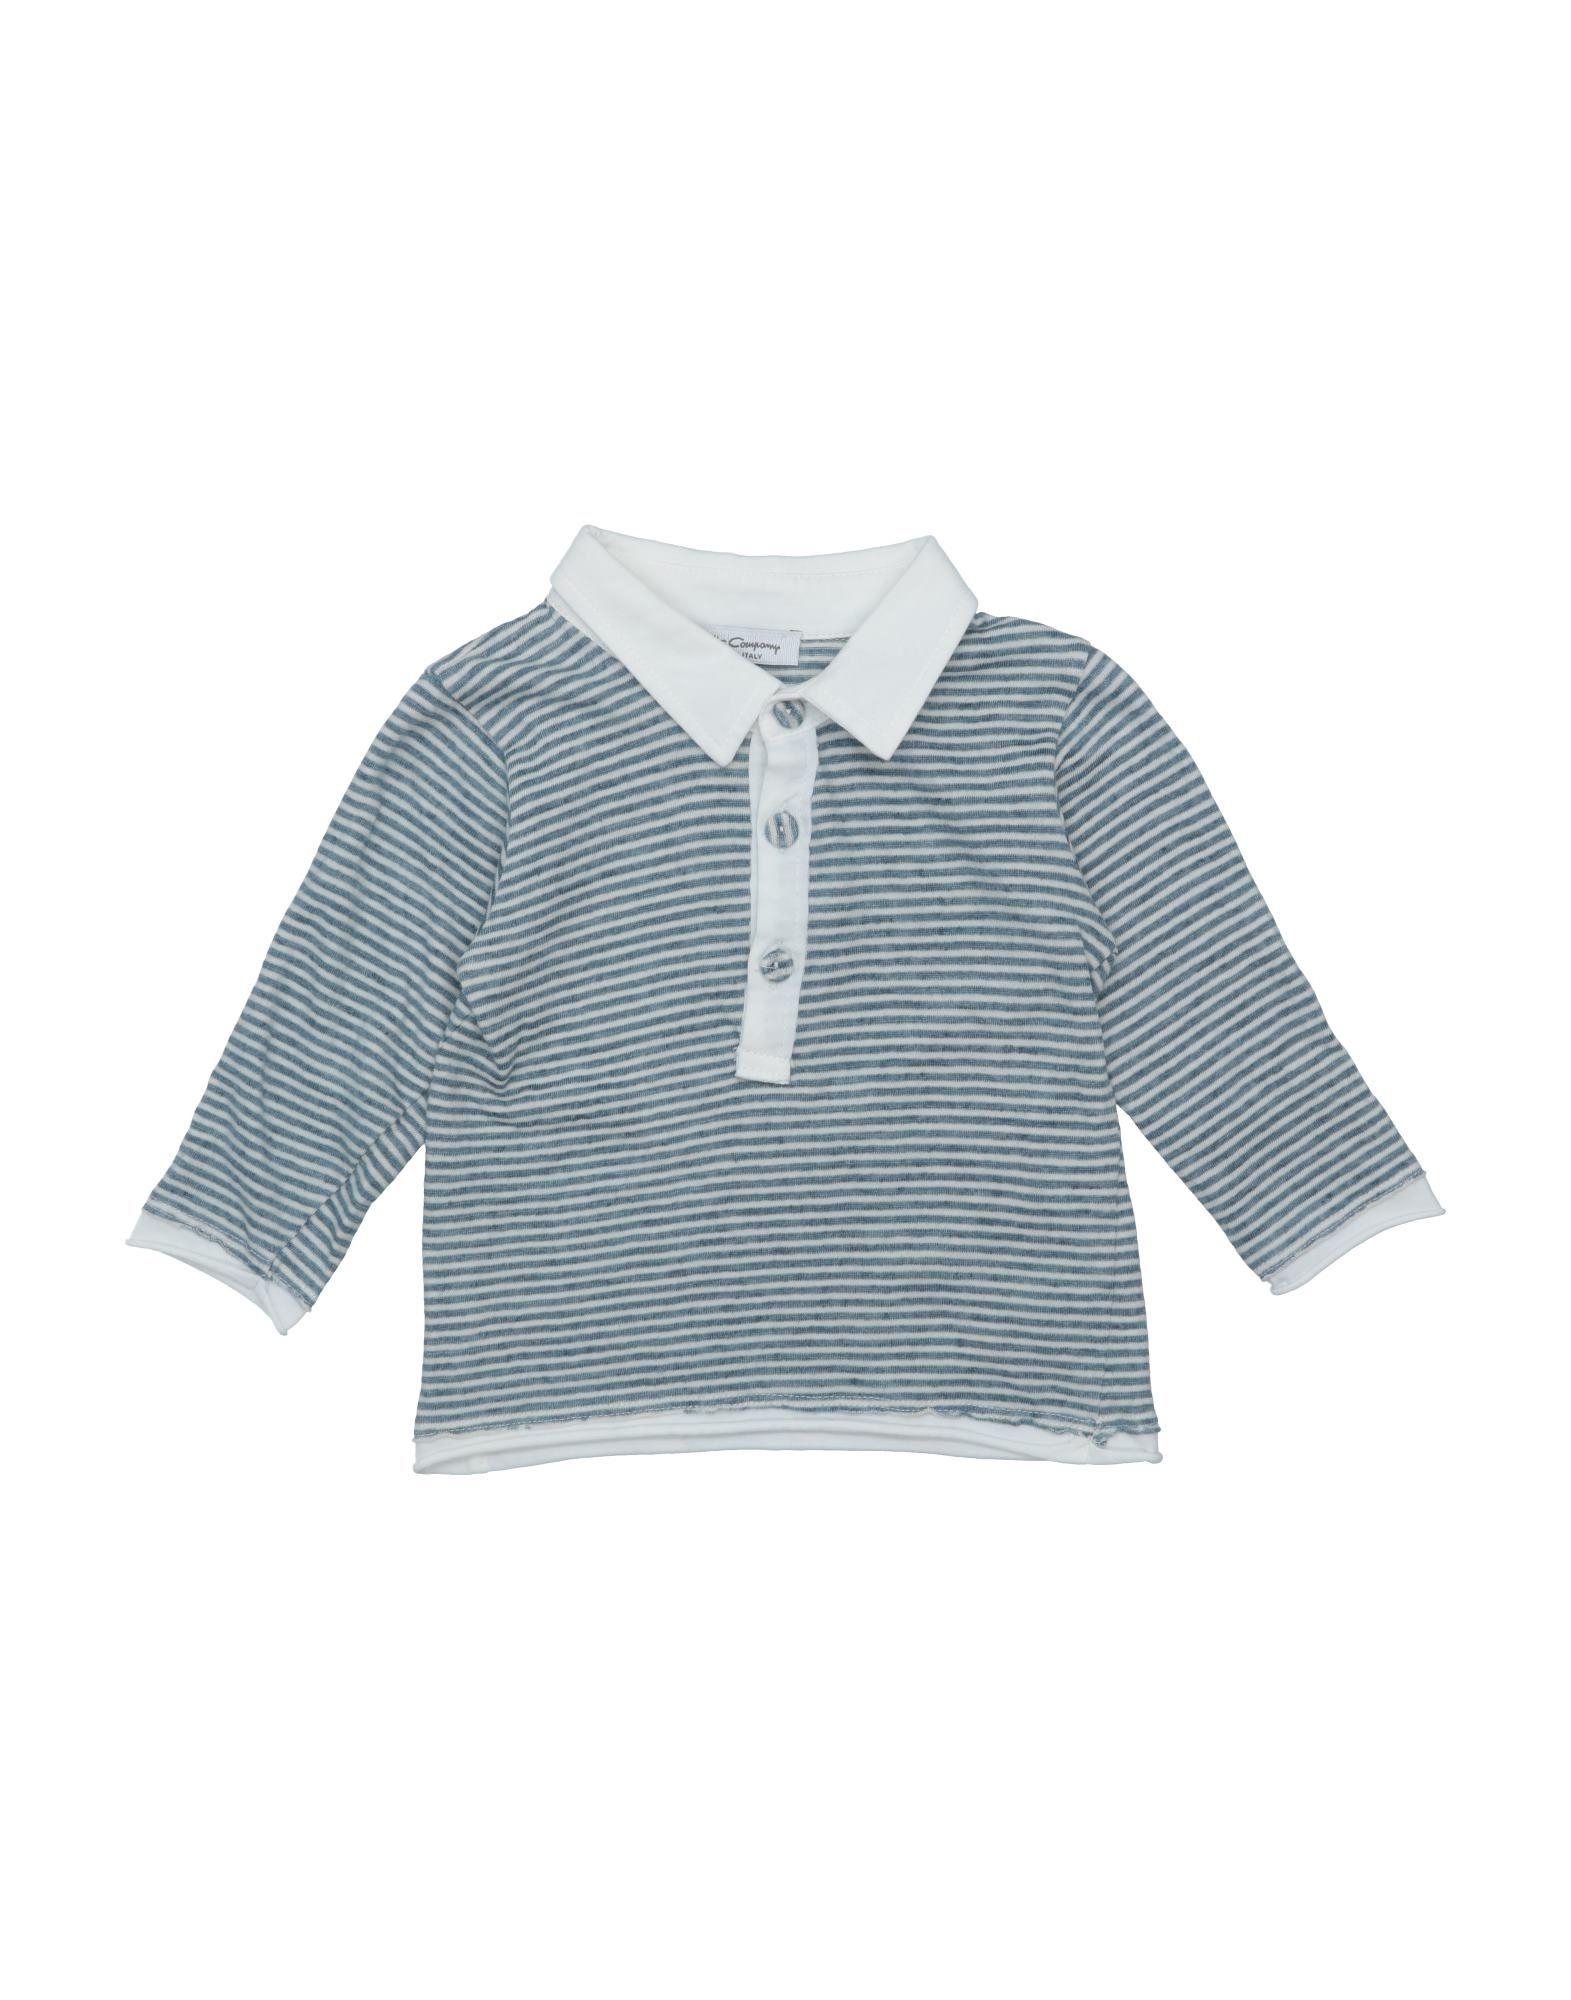 Kid's Company Kids' T-shirts In Blue